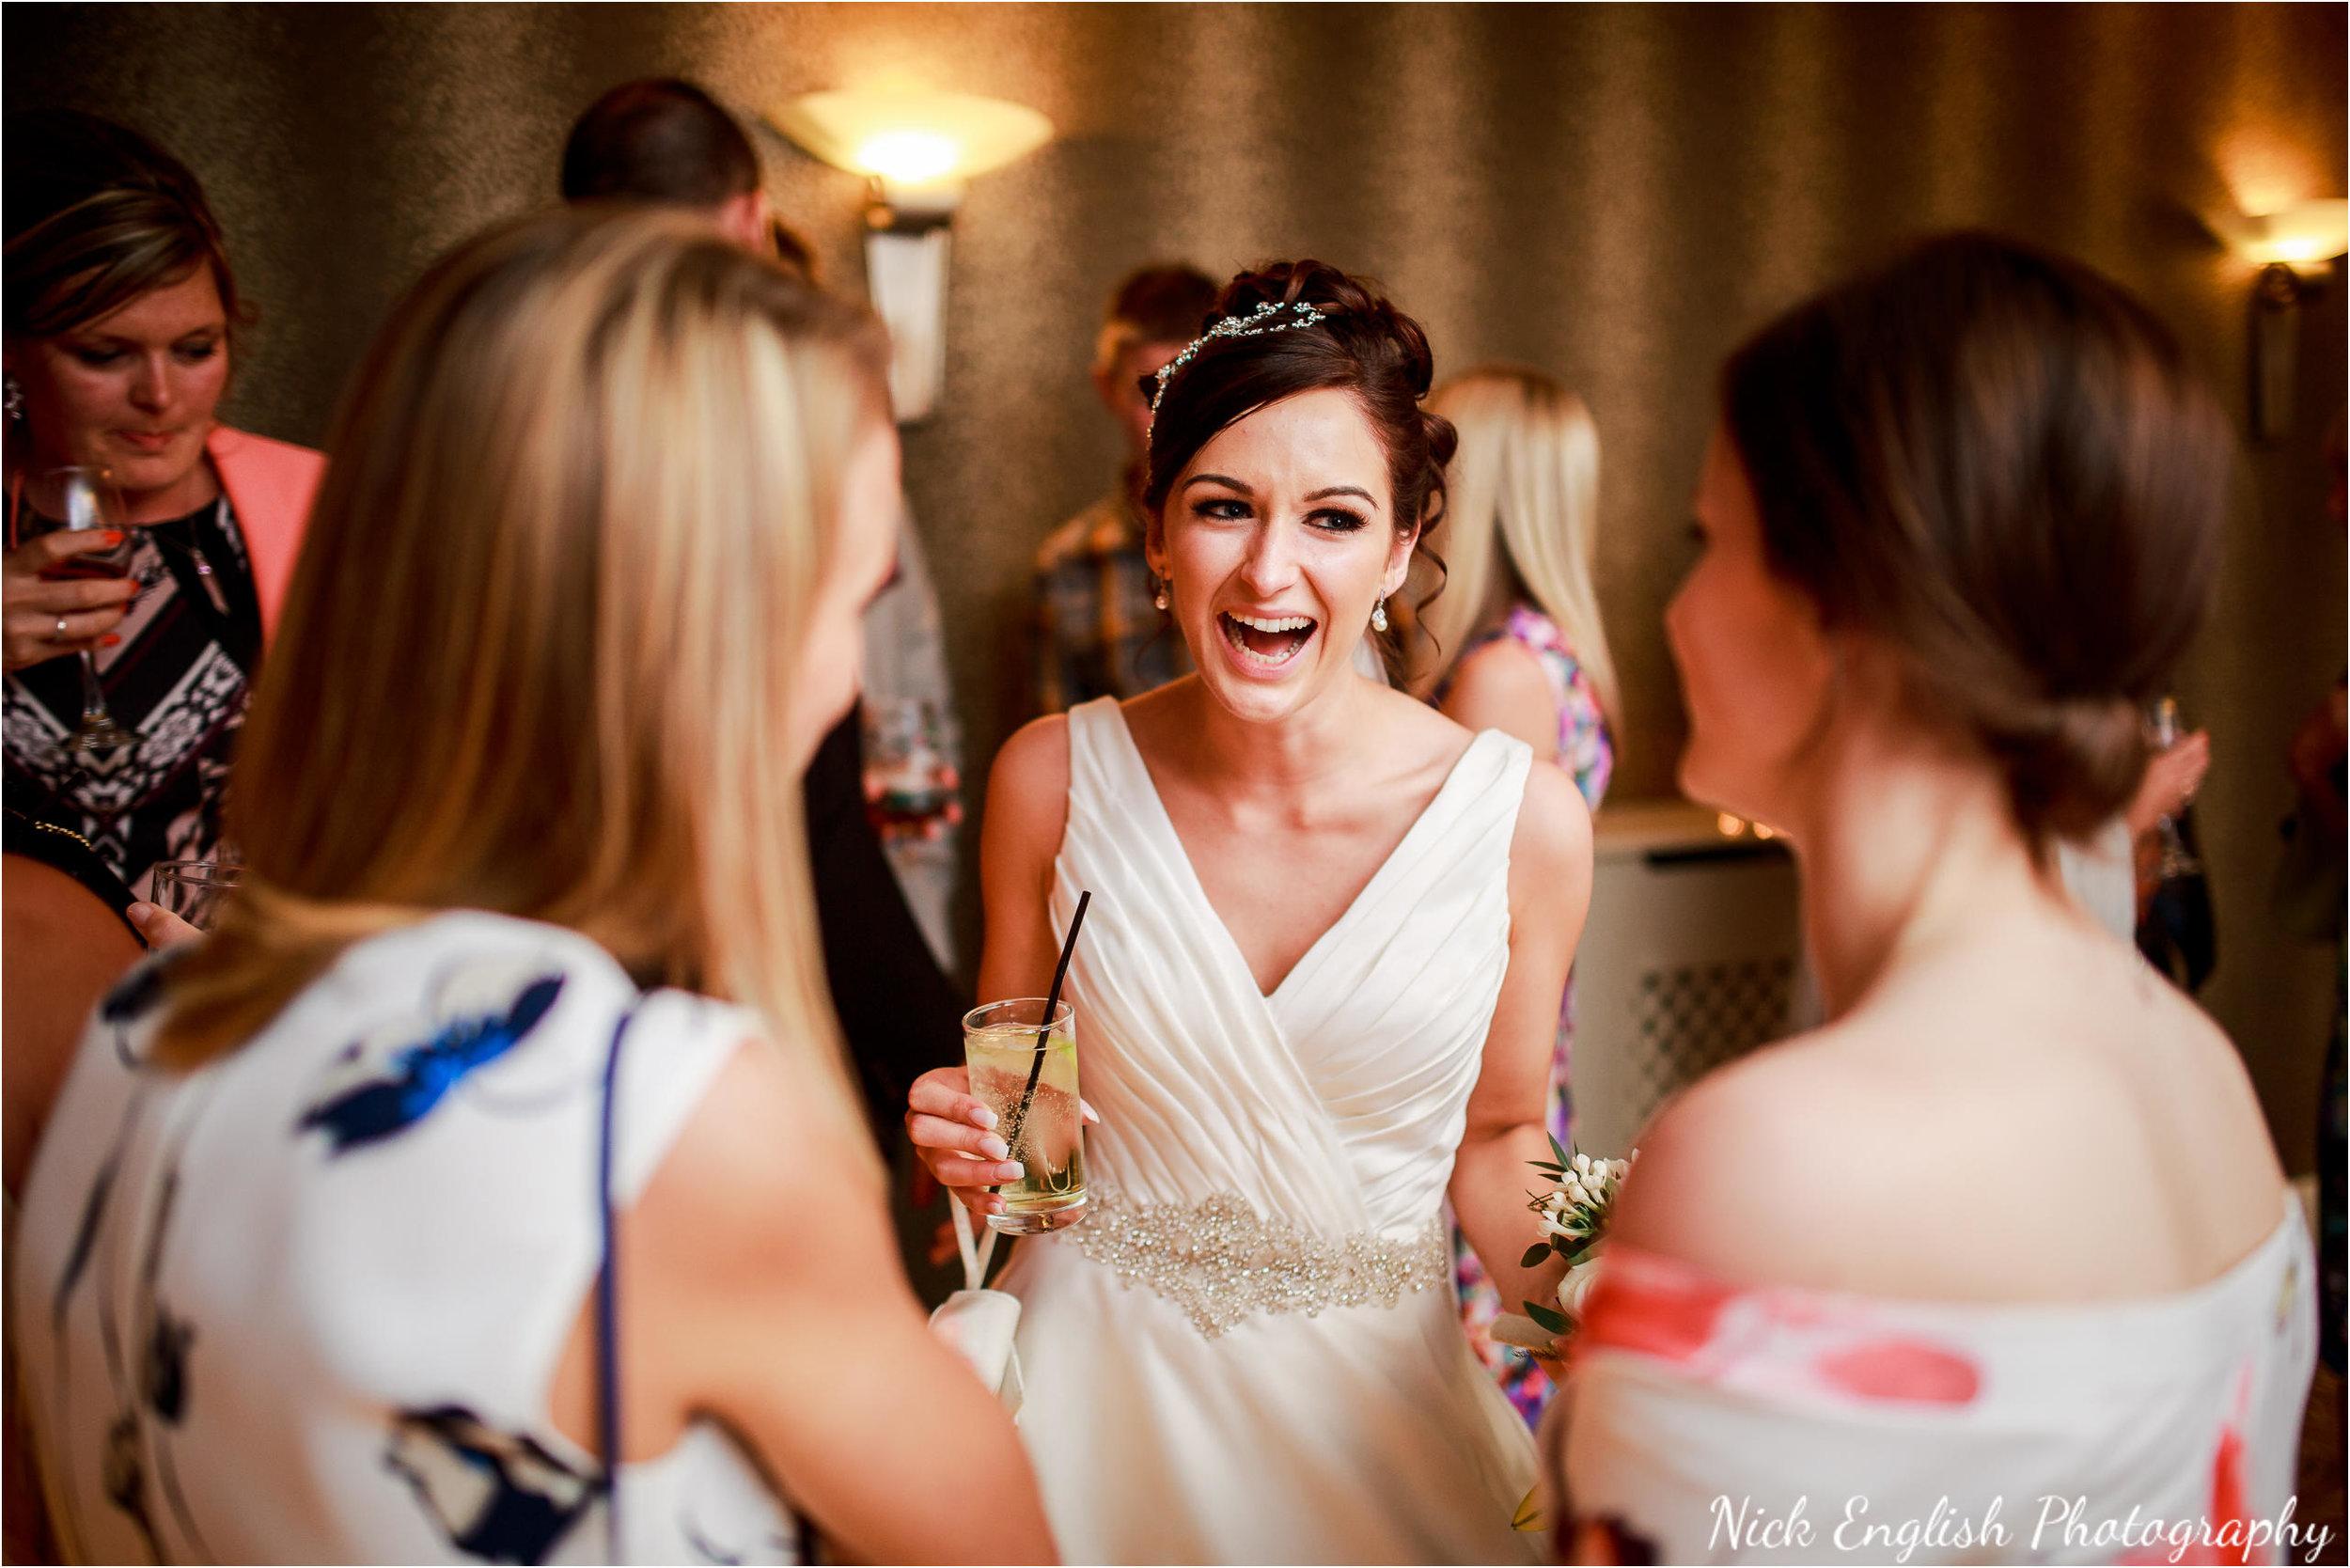 Emily David Wedding Photographs at Barton Grange Preston by Nick English Photography 204jpg.jpeg